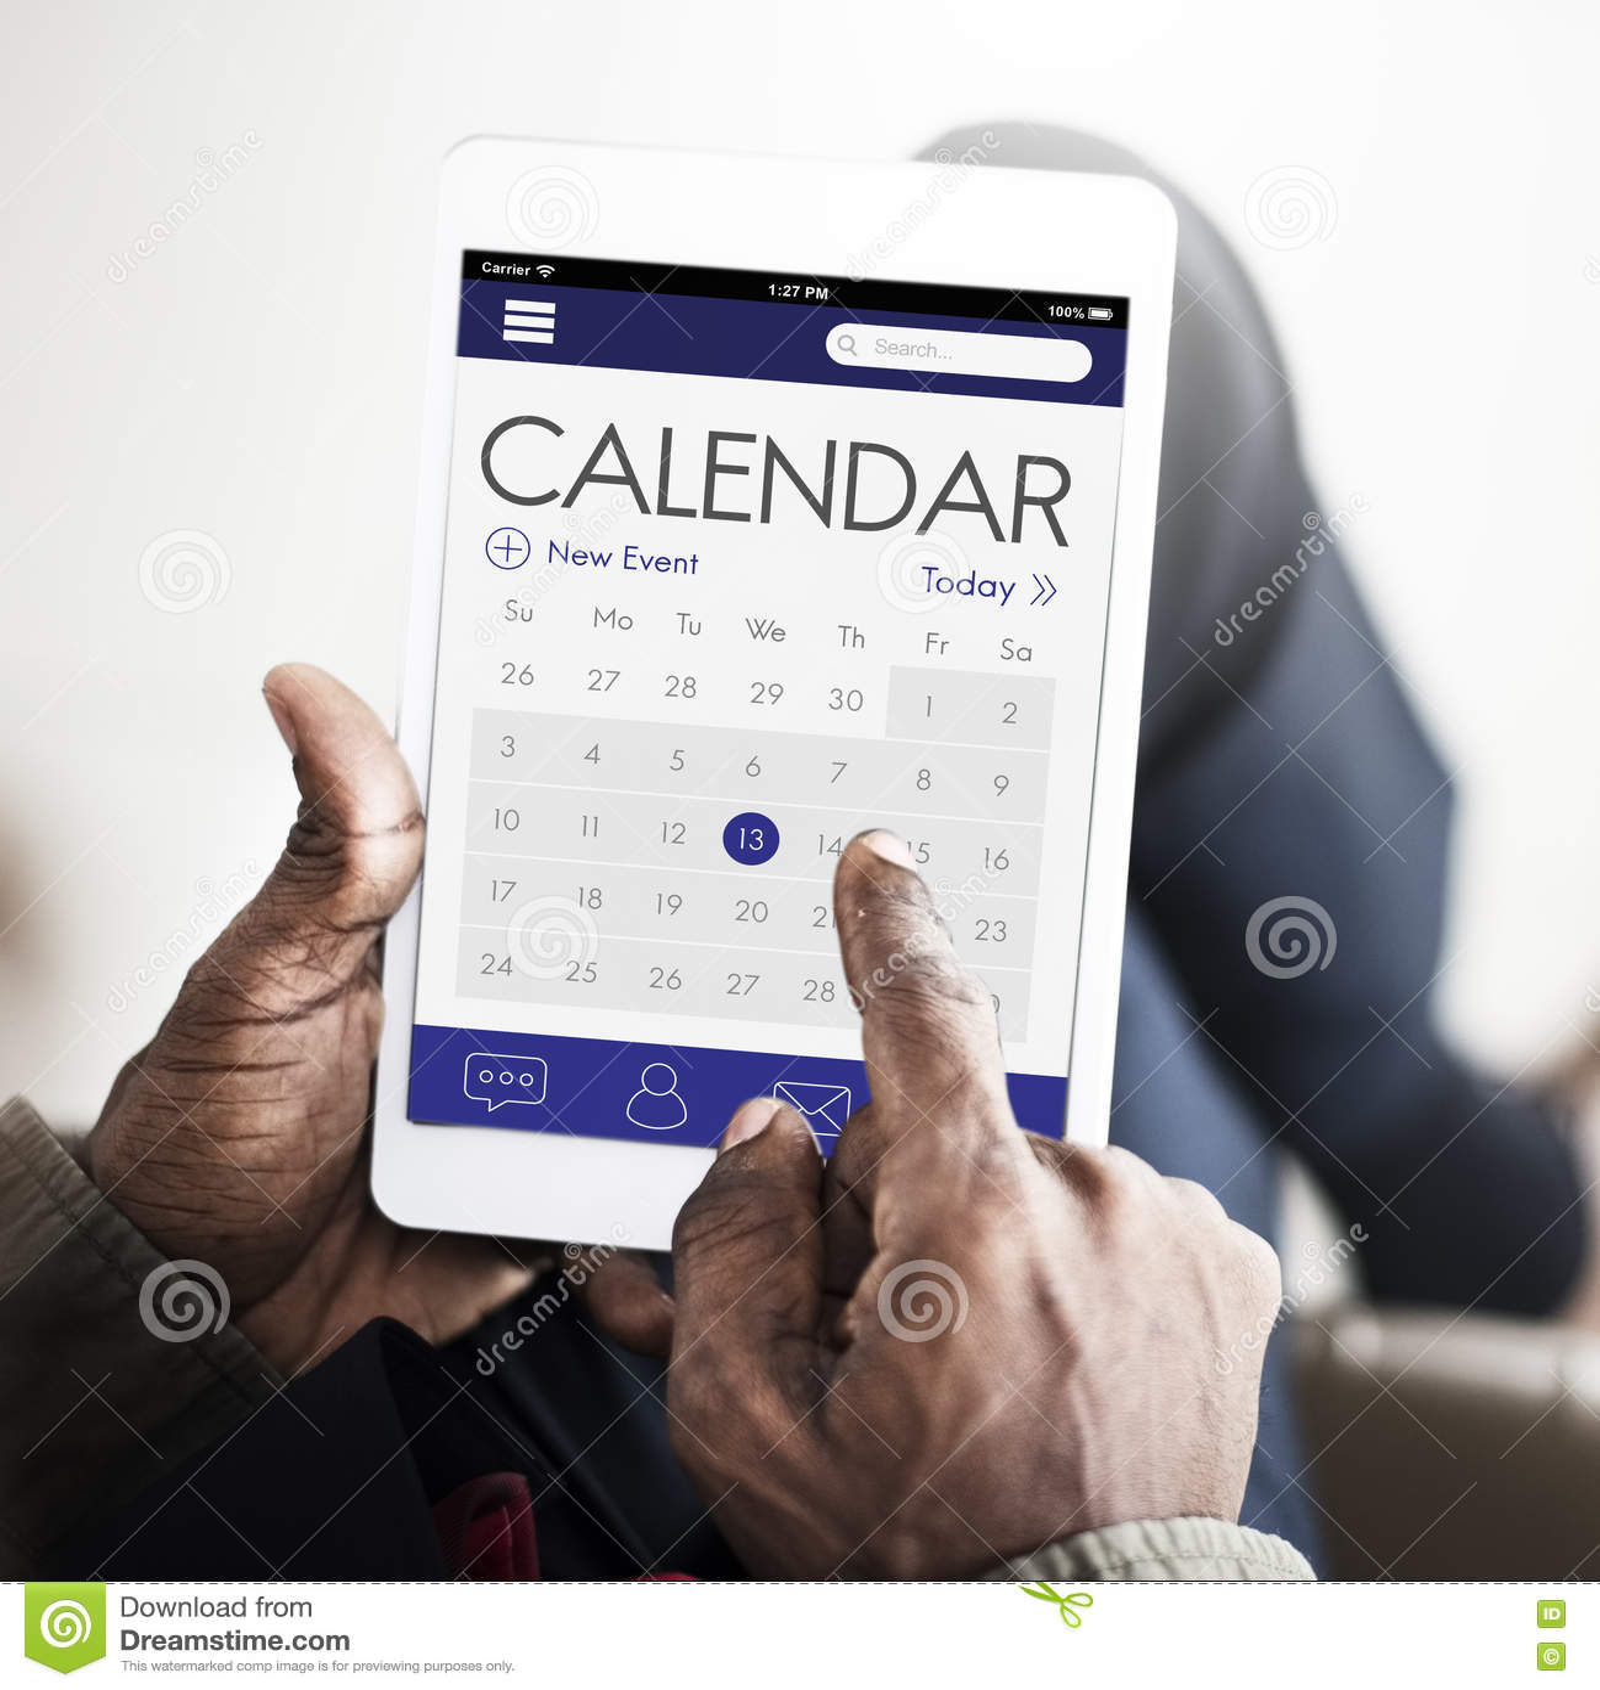 Calendar Date Organizer Planner Concept Stock Photo - Image: 81514723